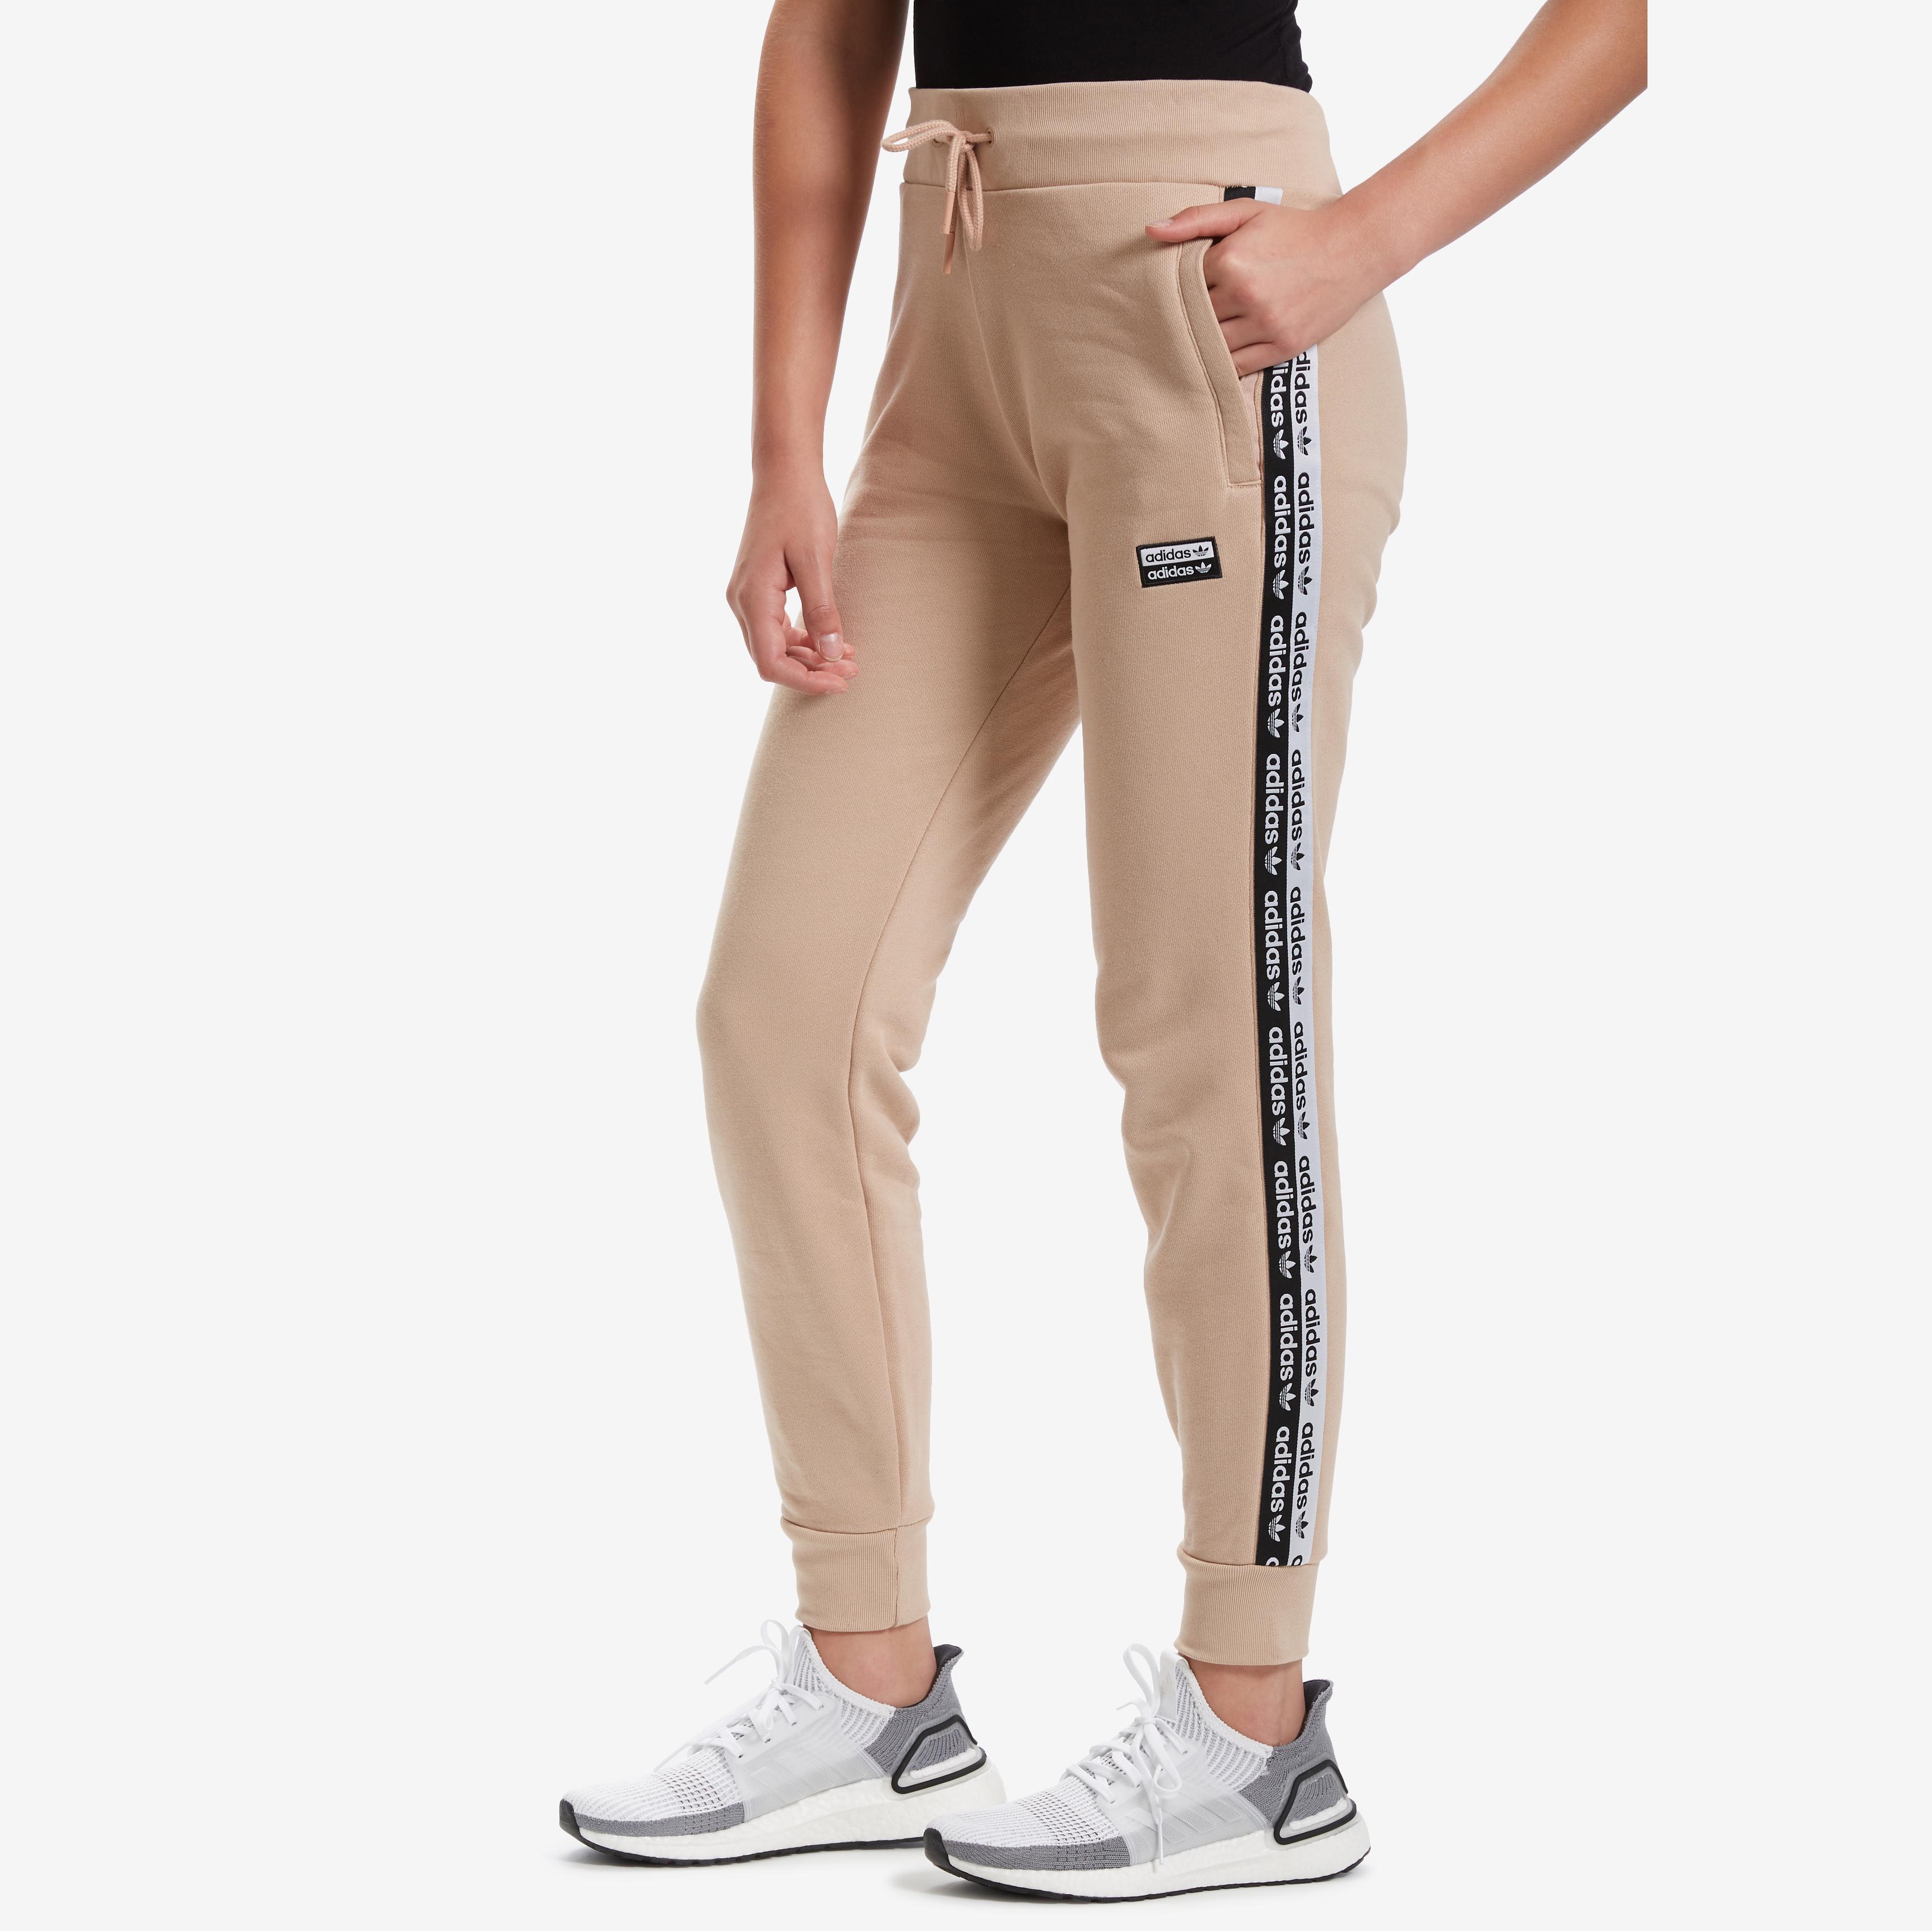 Women's Cuff Pants